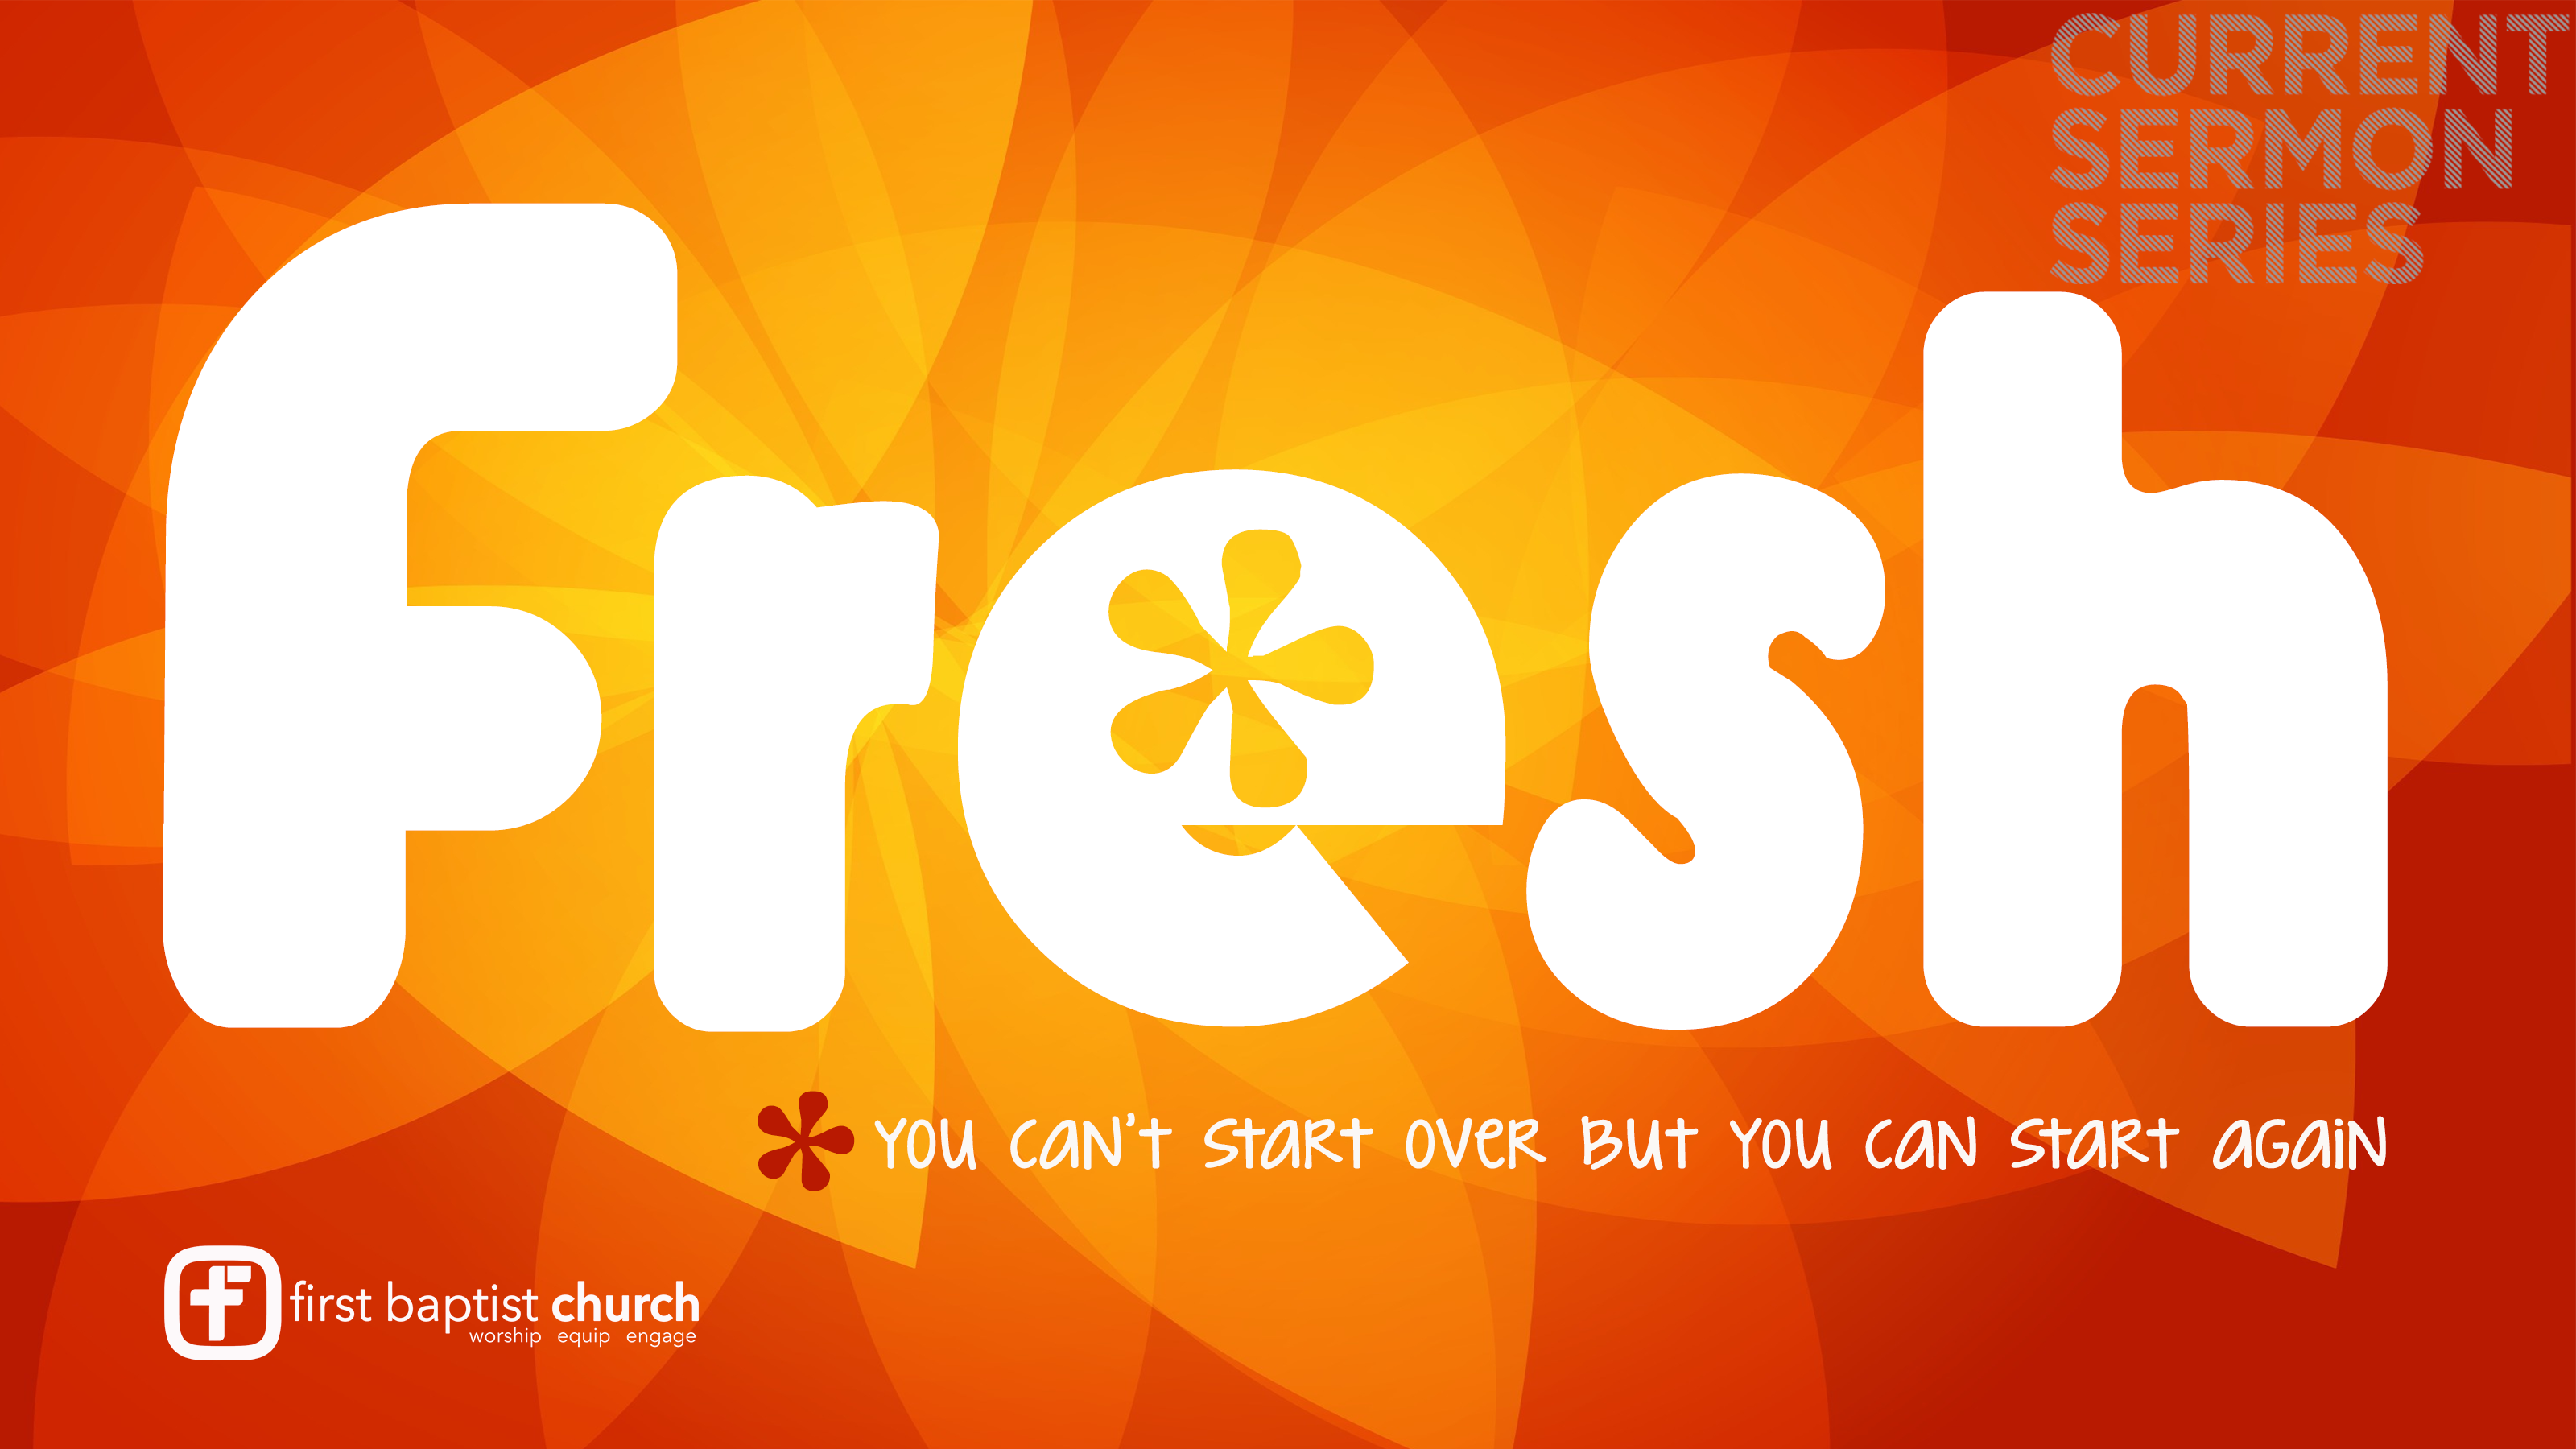 fresh-current